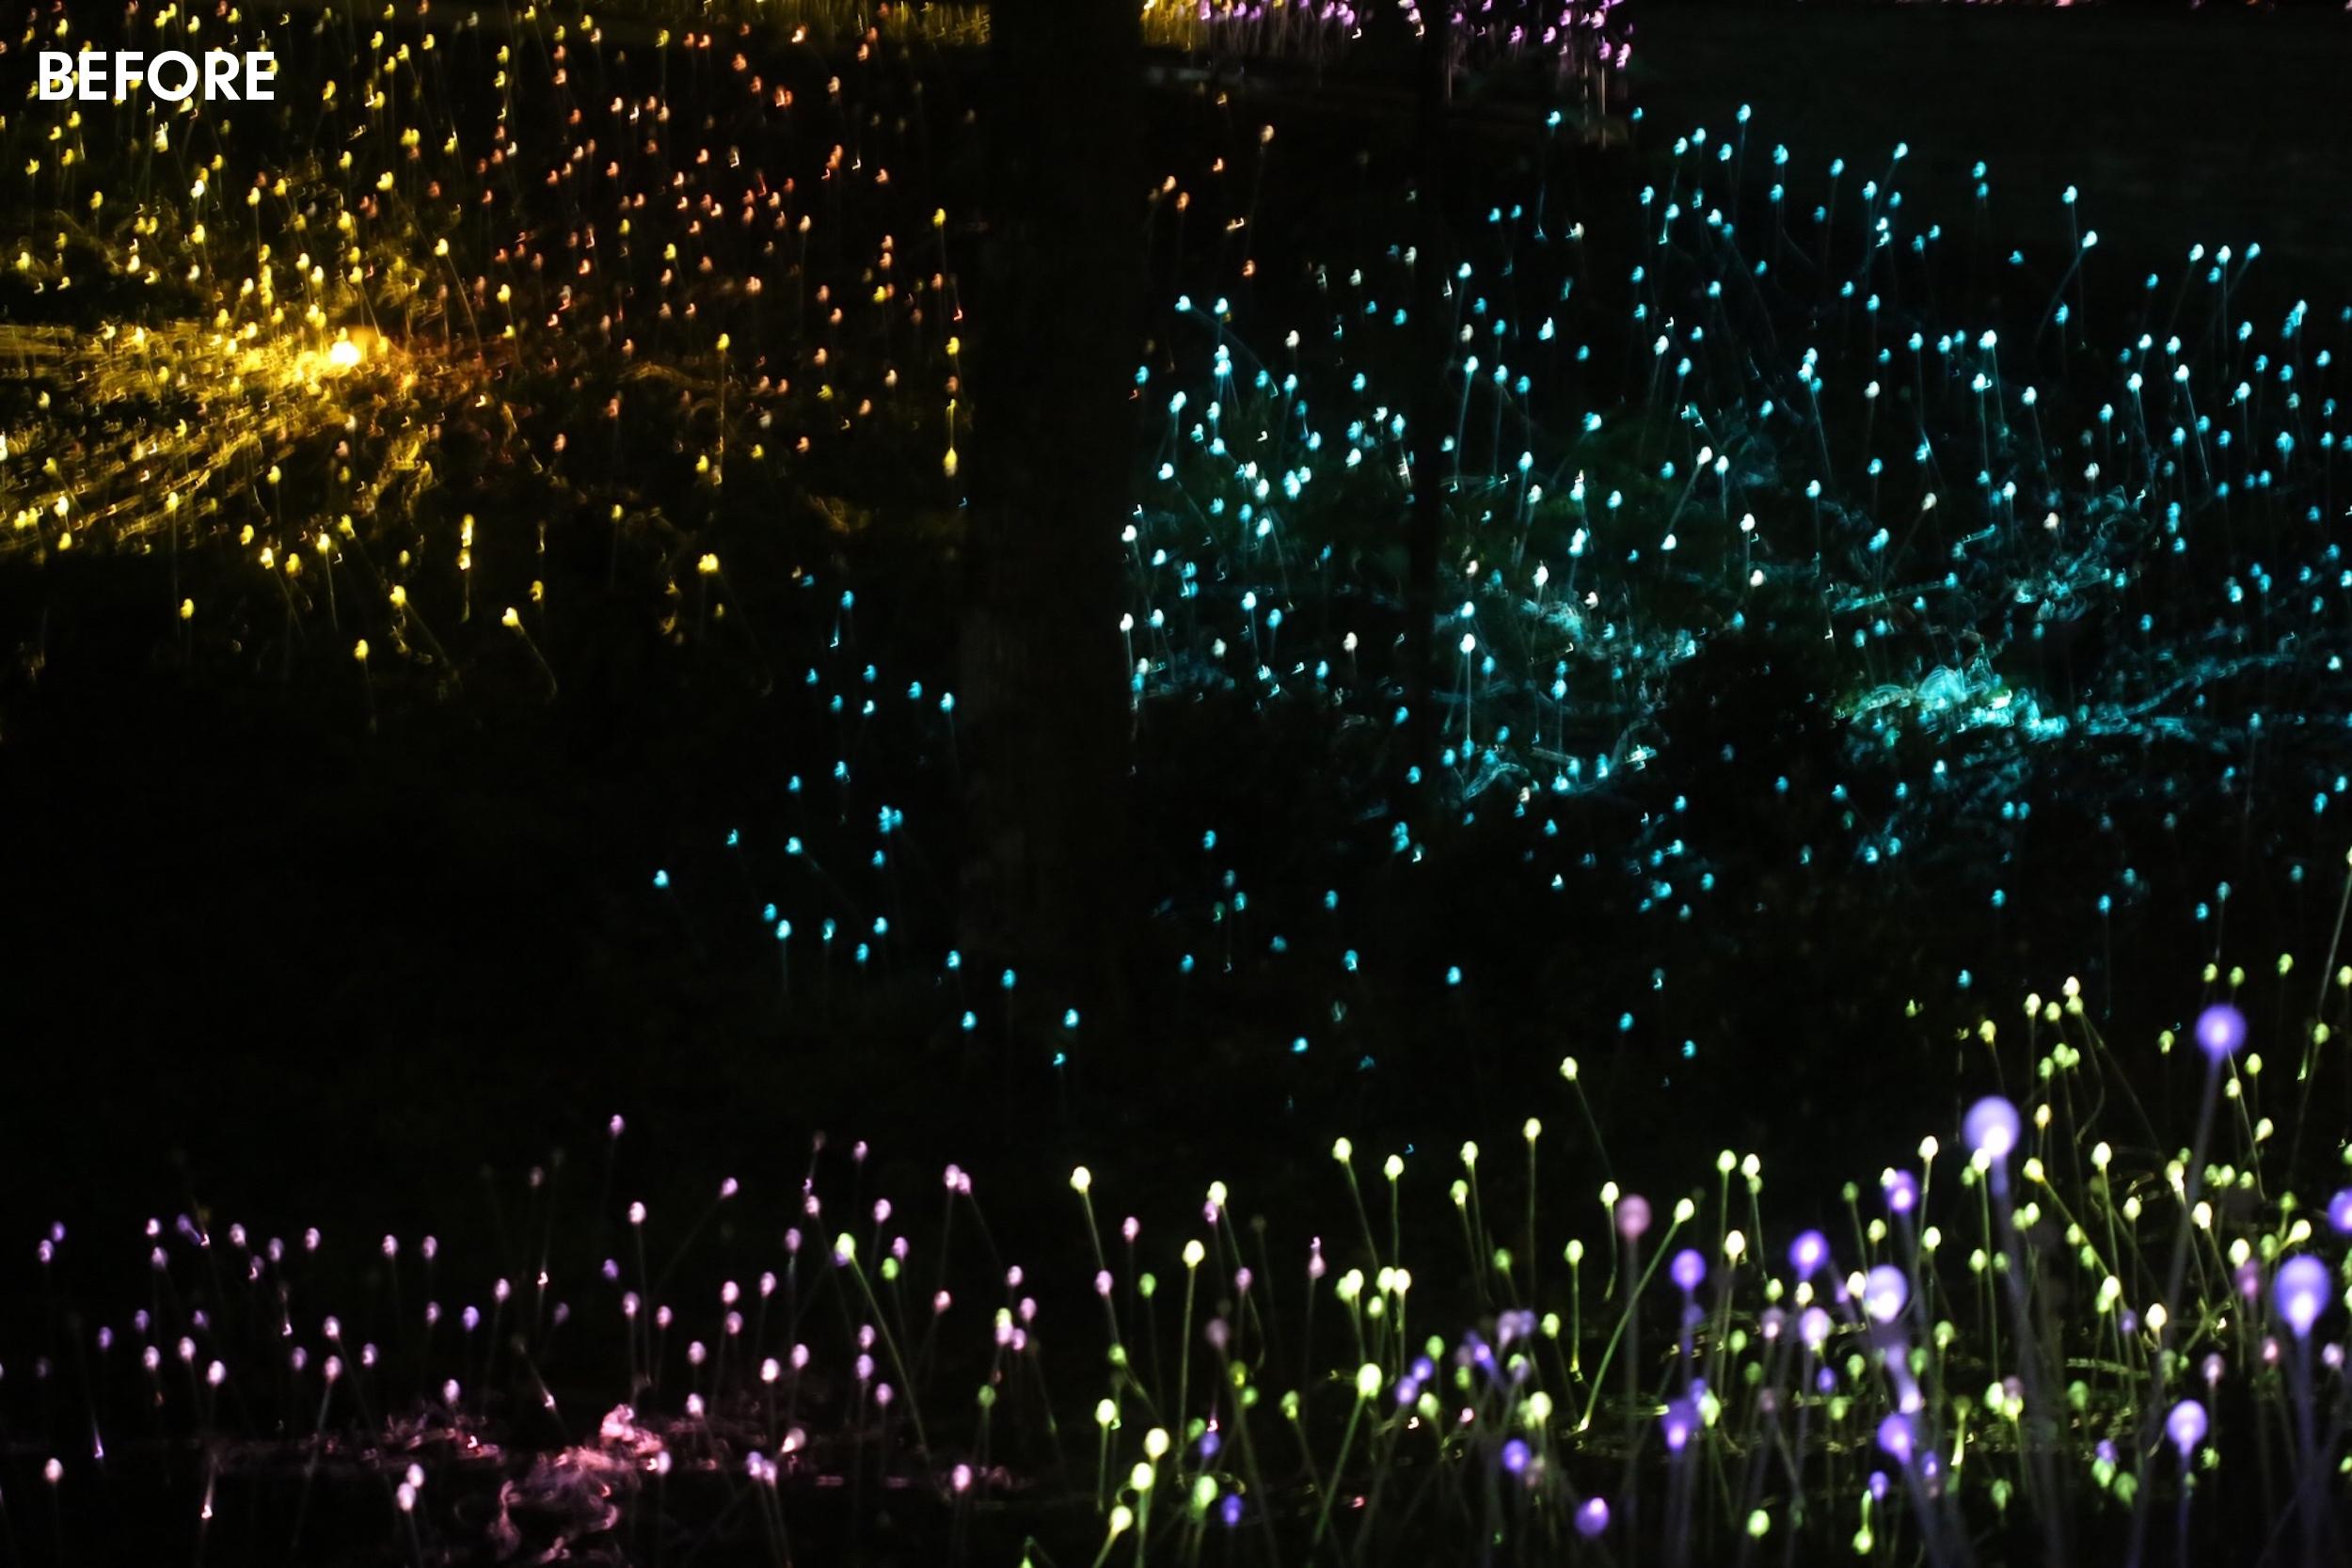 glowforest-atlantachickpeach-lightroom-presets12.jpg